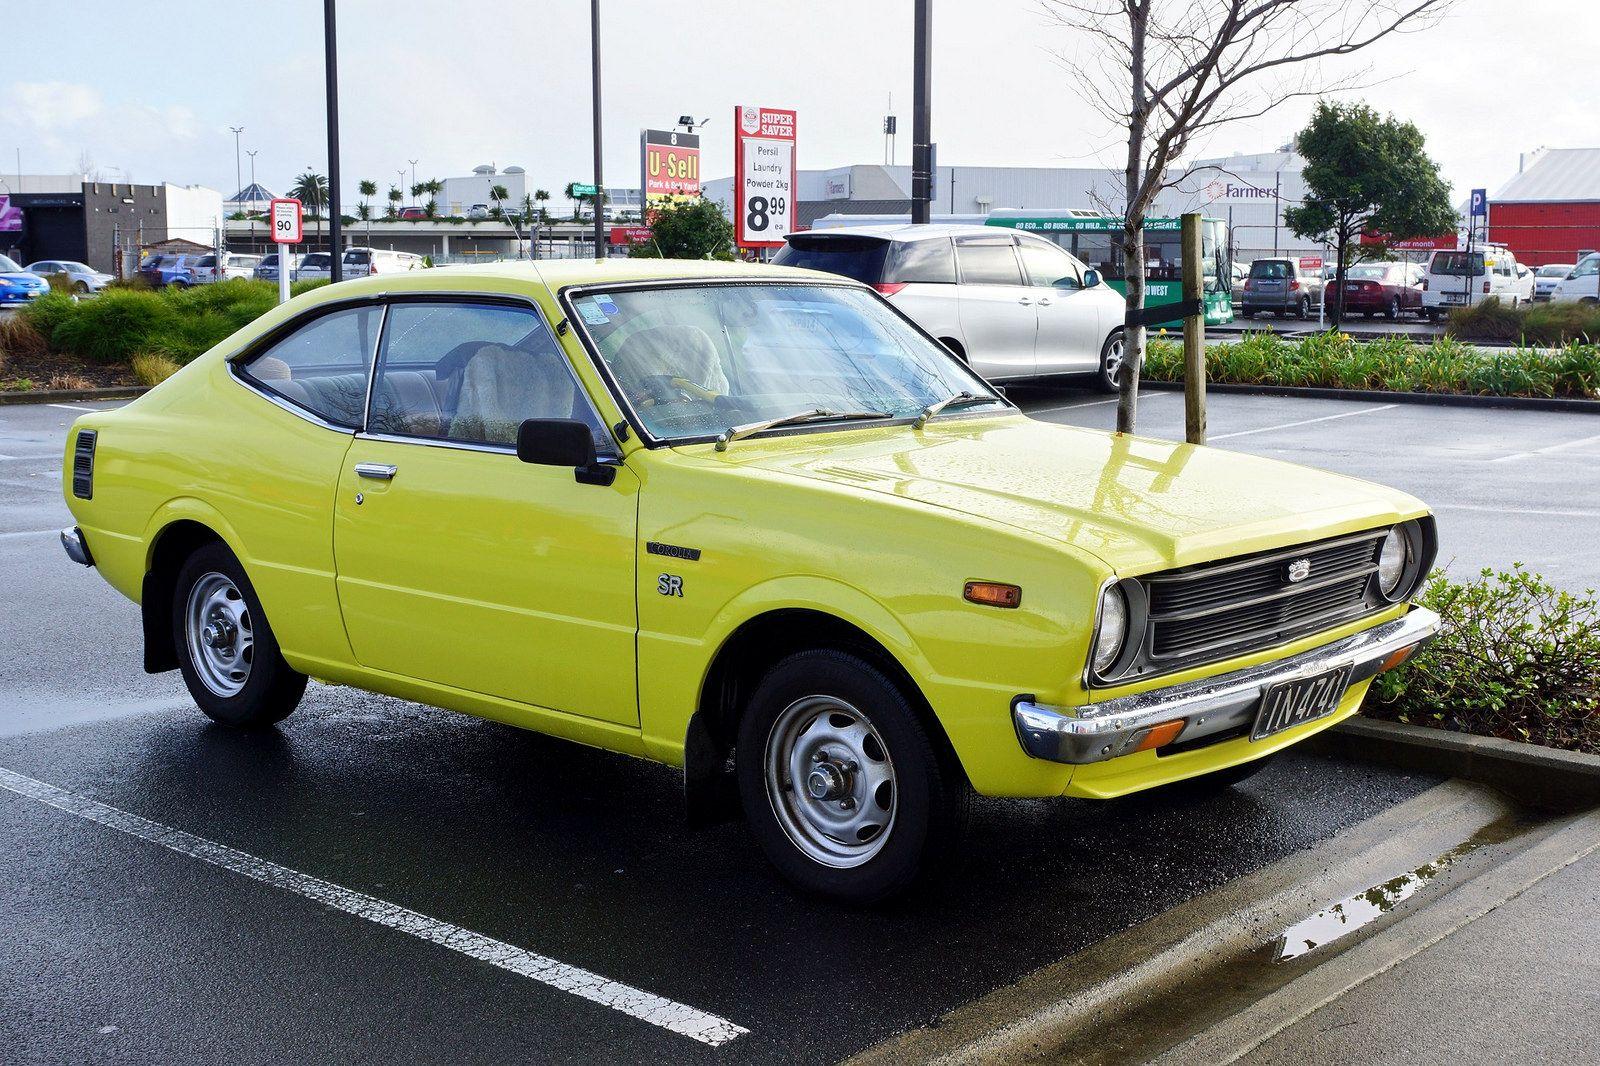 1977 Toyota Corolla SR | Toyota and Cars